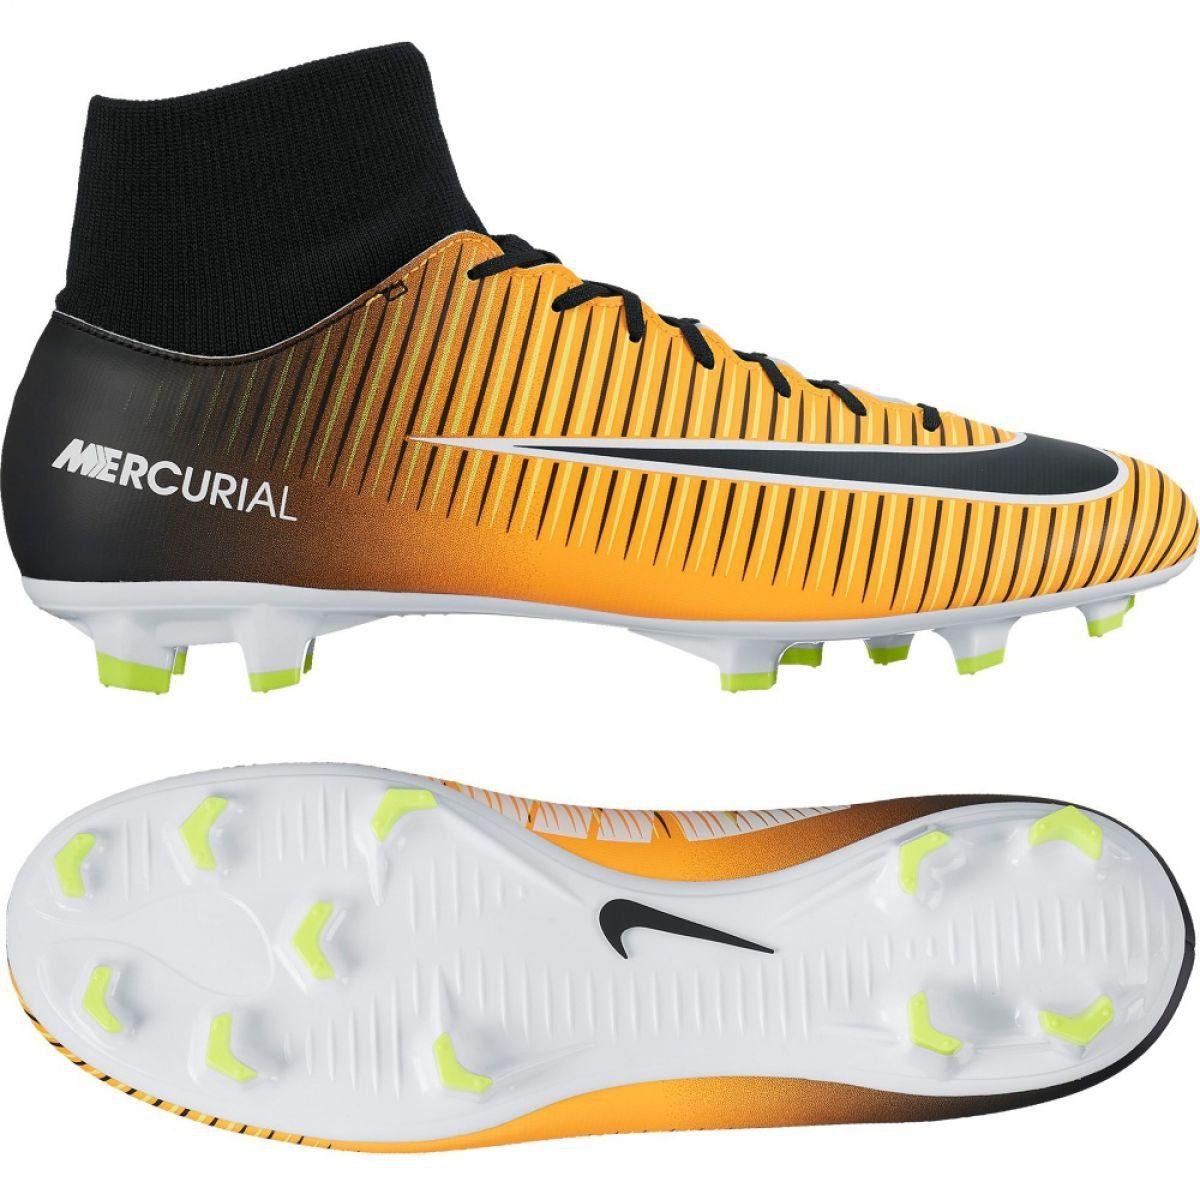 Buty Nike Mercurial Victory Vi Df Fg M 903609 801 Zolte Pomaranczowe Womens Athletic Shoes Nike Cleats Mens Football Boots